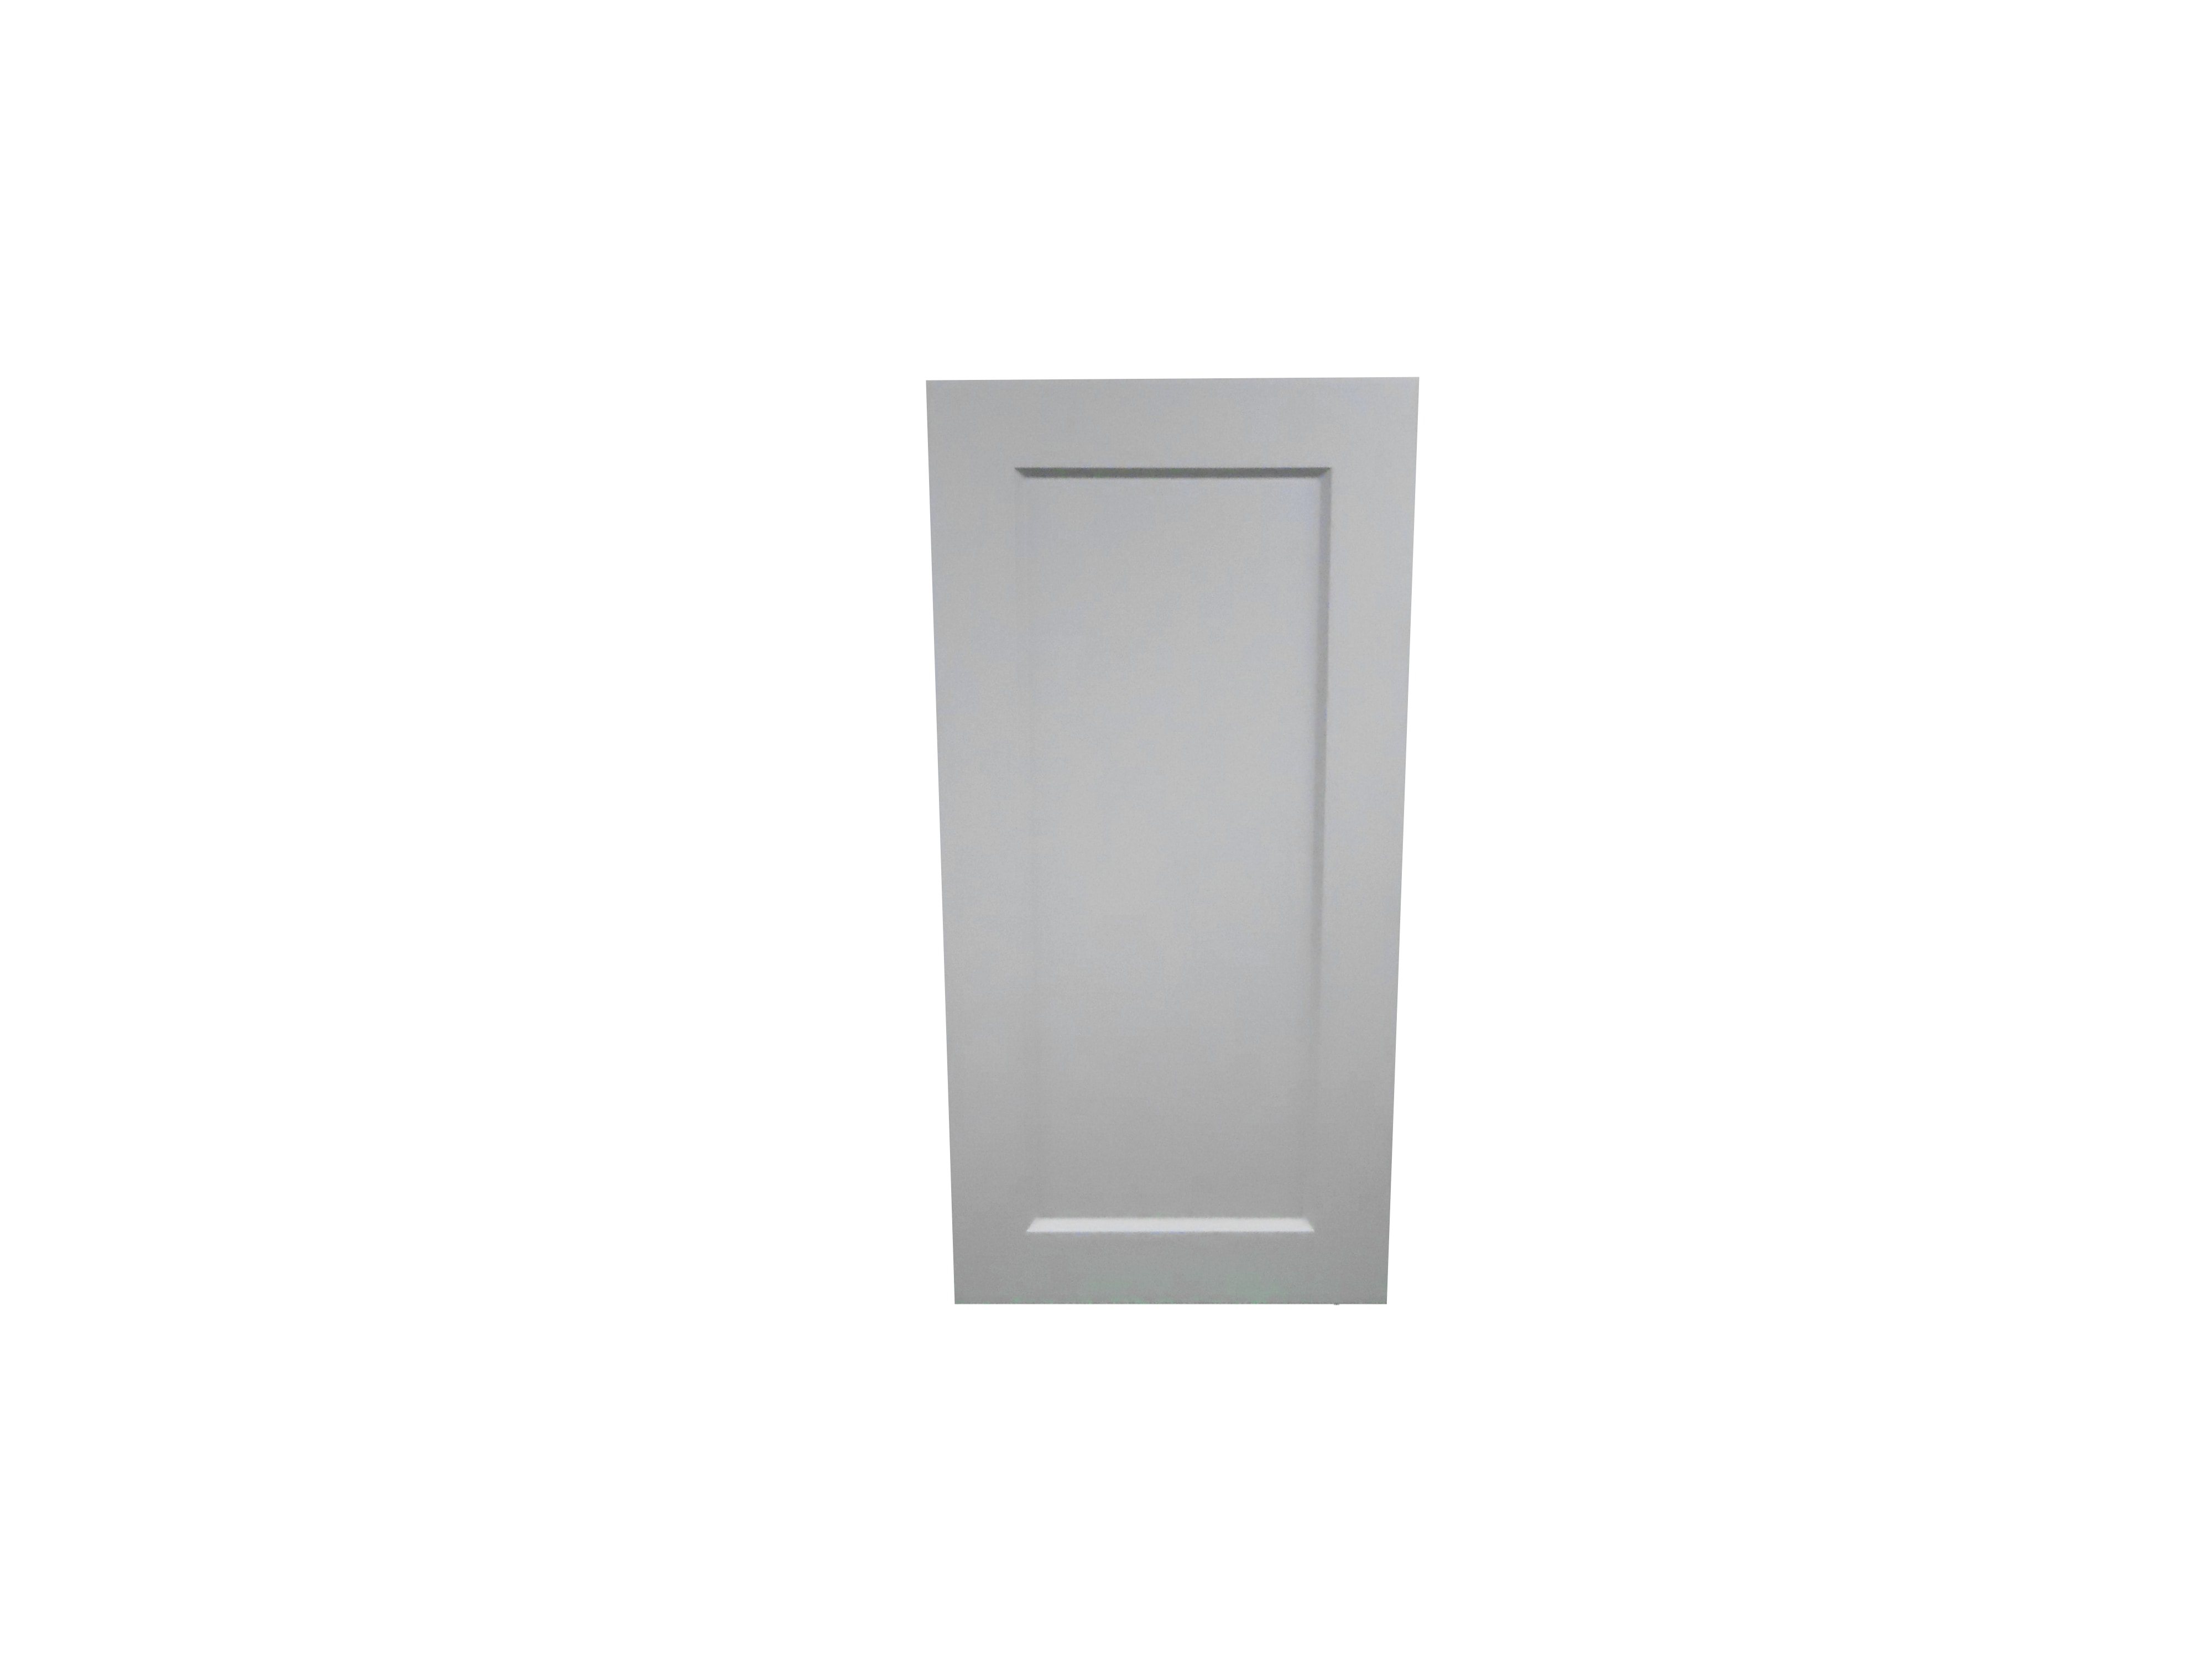 Wall Cabinet / Whistler Grey / Flat Panel Grey / 15x30 Whistler Grey 0